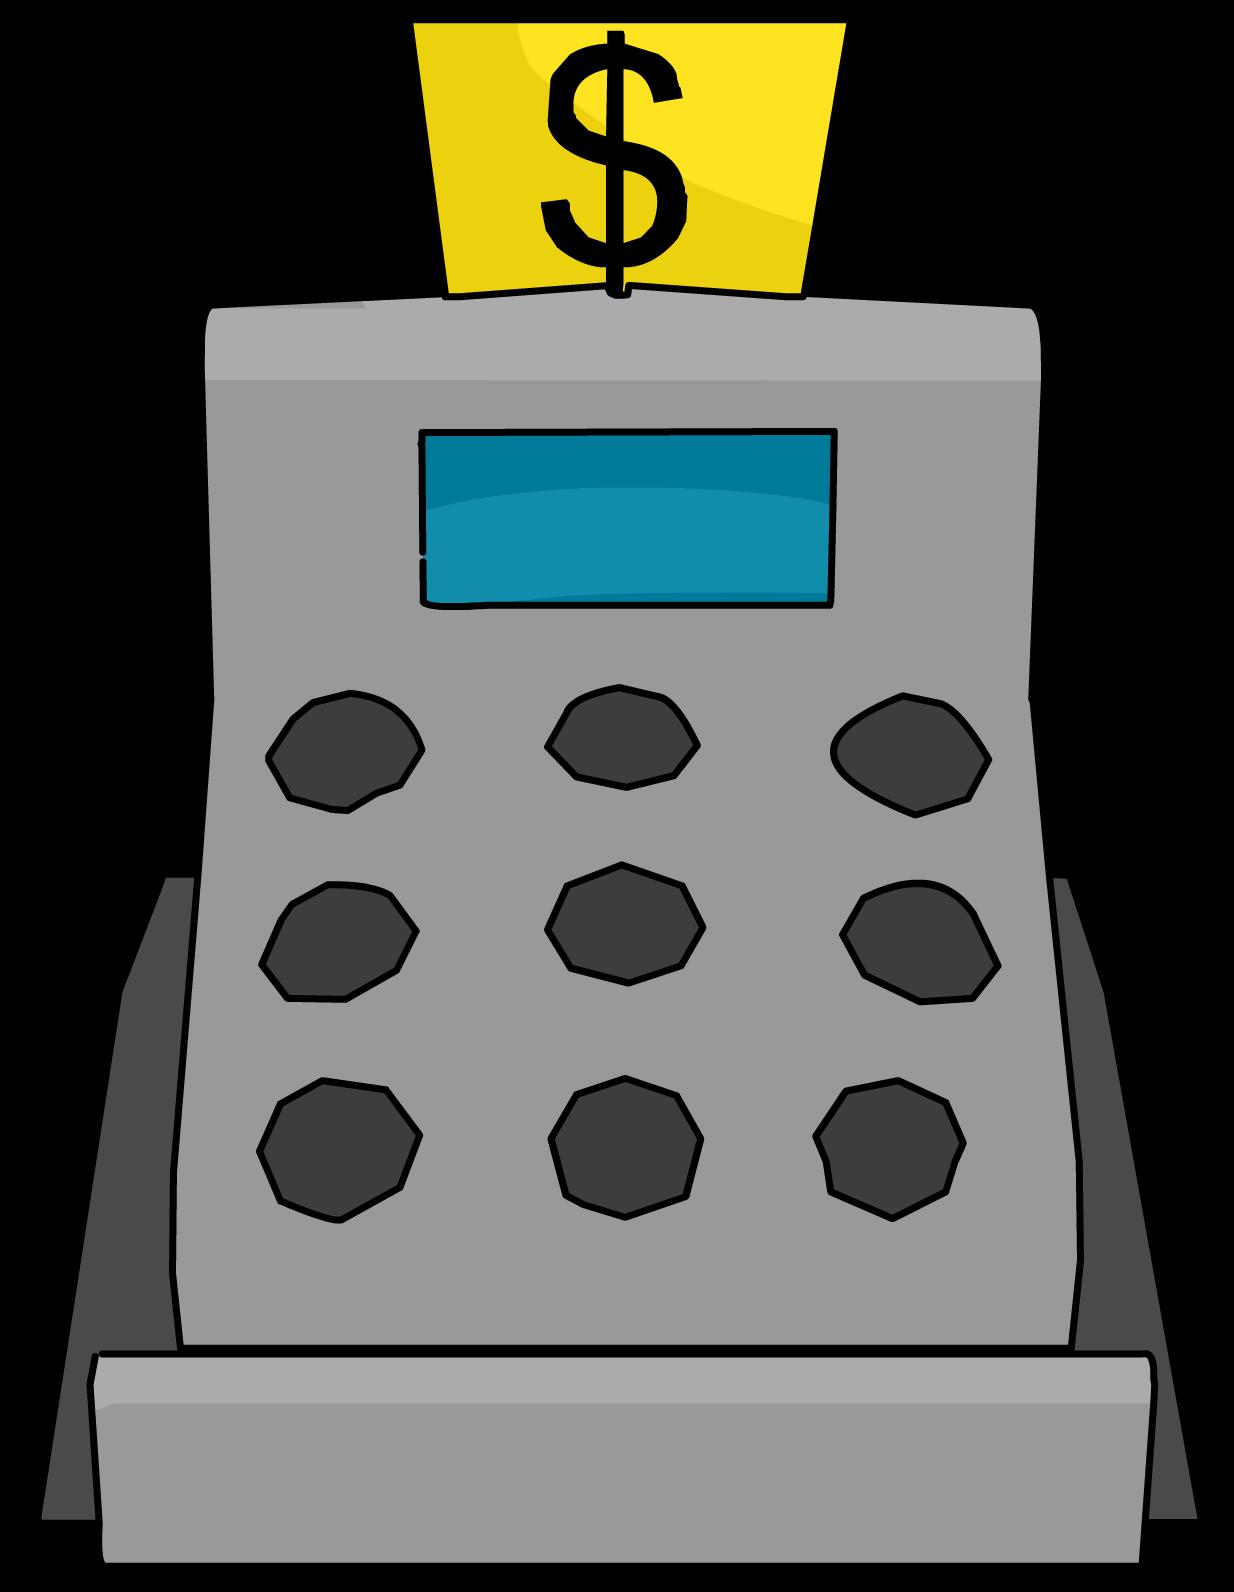 Cash Register | Club Penguin Wiki | Fandom powered by Wikia